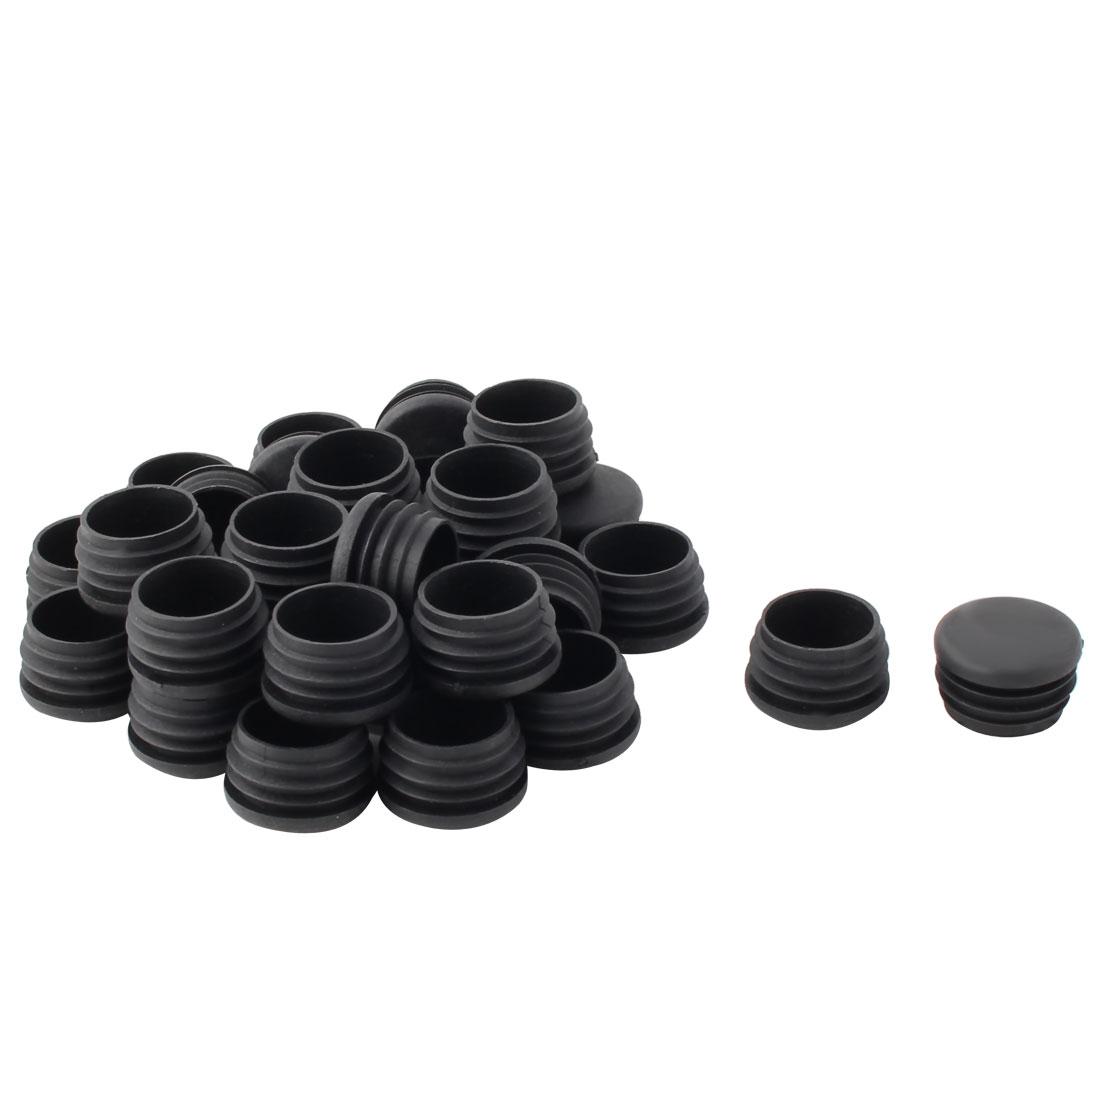 Plastic Round Tube Insert Blanking End Protectors Caps Black 32mm 30 PCS